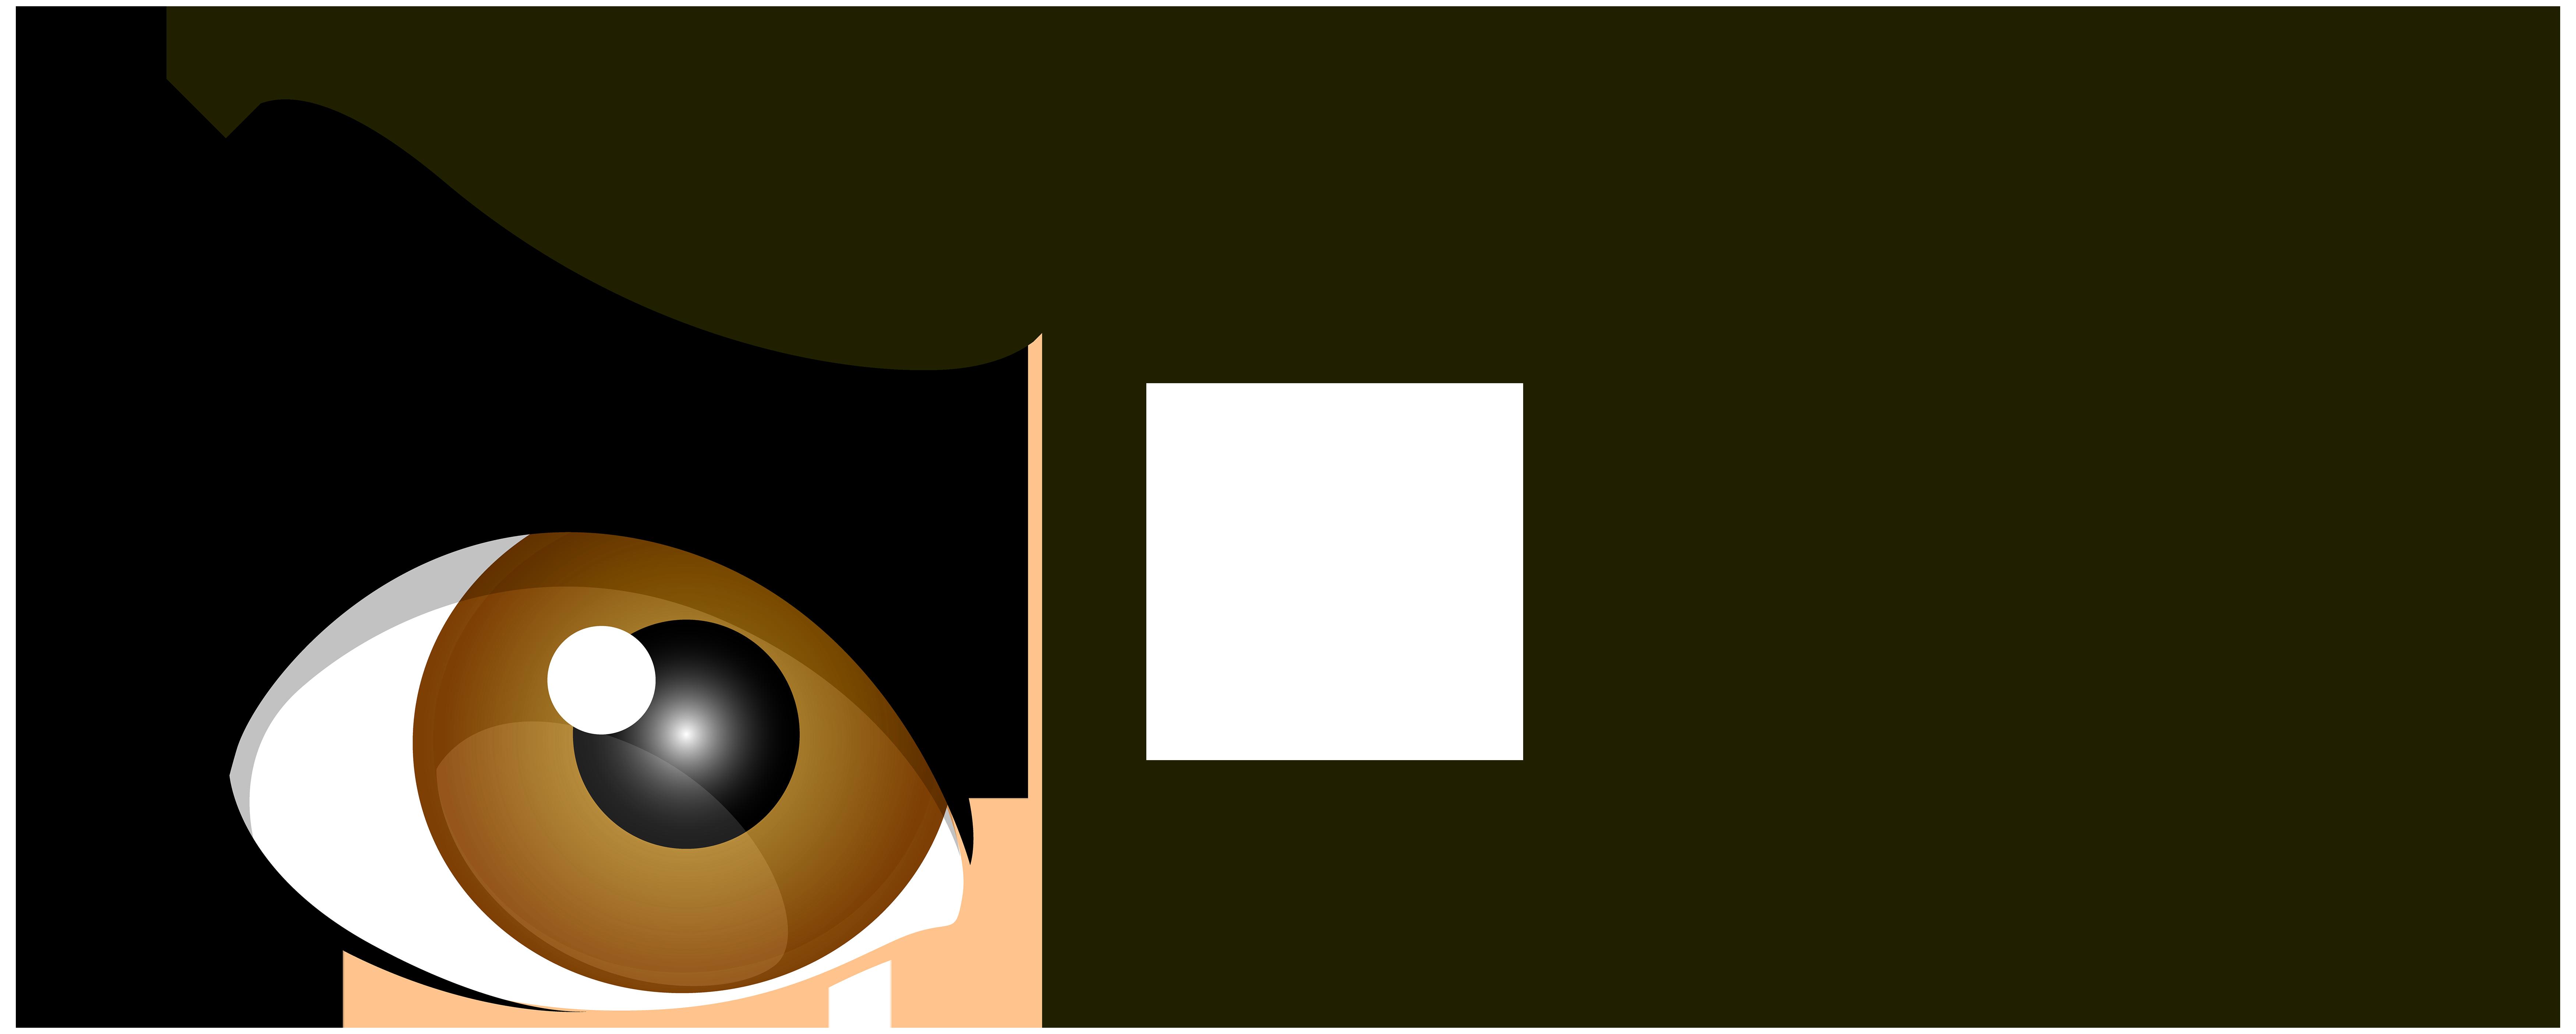 Brown winking eyes png. Eyeballs clipart female eye